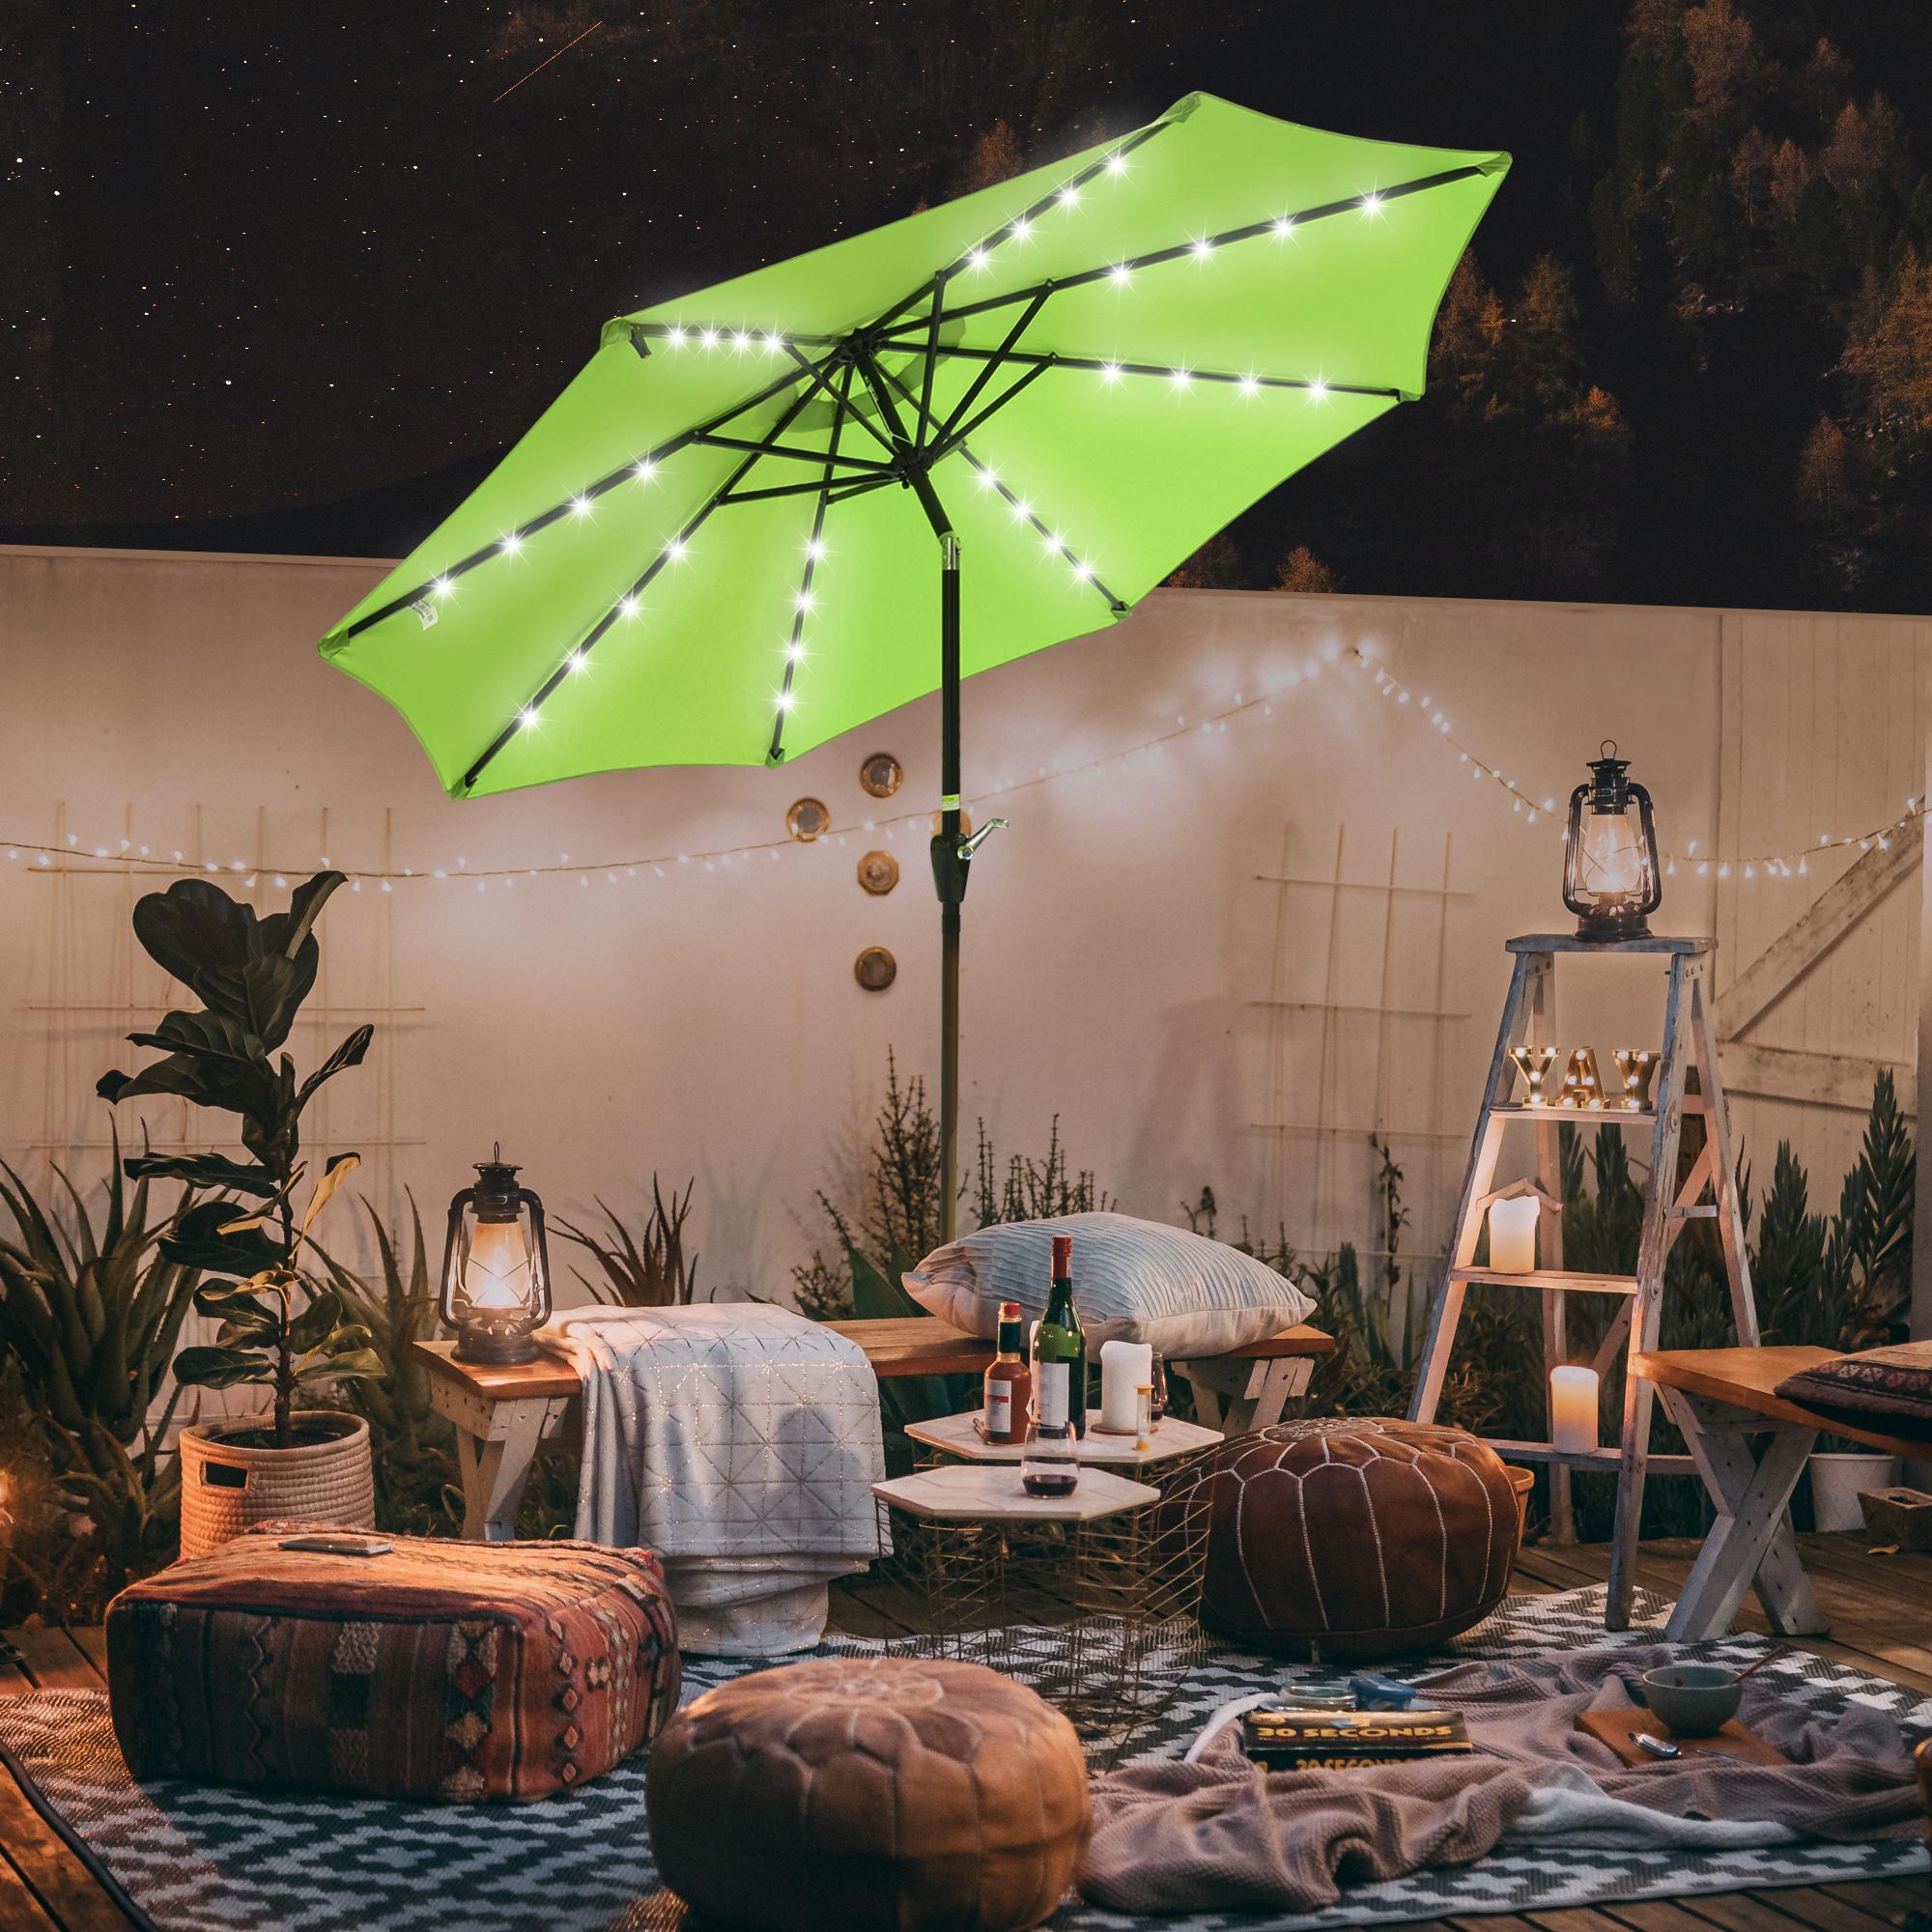 thumbnail 20 - 9' Patio Outdoor Umbrella Solar LED 8 Rib Garden Parasol Yard Deck Table Shade